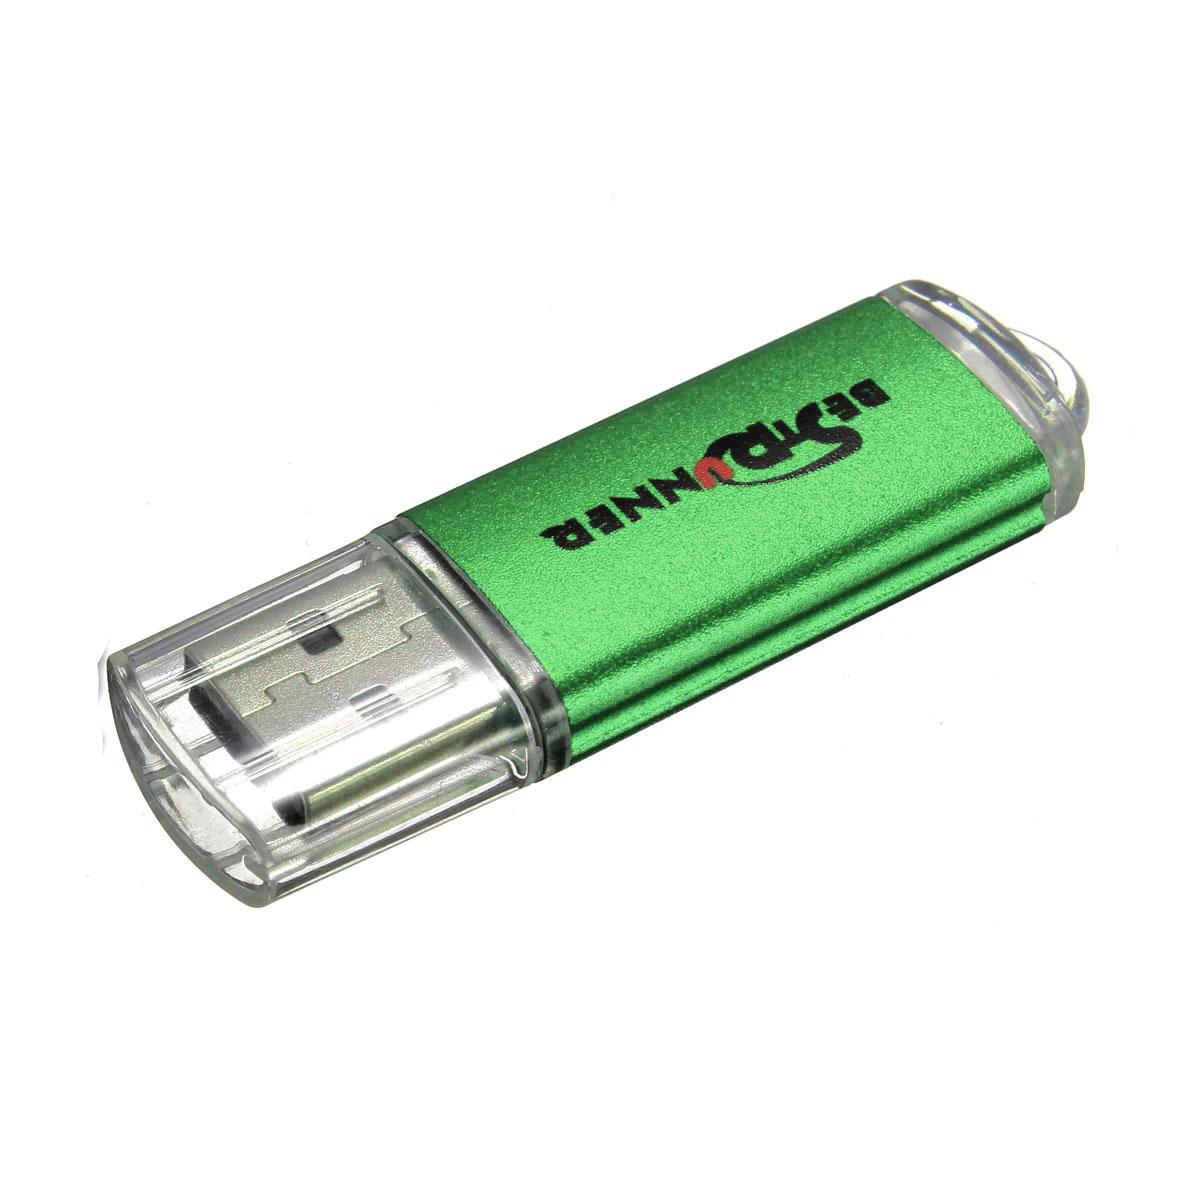 BESTRUNNER Pendant 8GB USB 2.0 Flash Drive Pen Bright Memory Stick Thumb Disk Gift